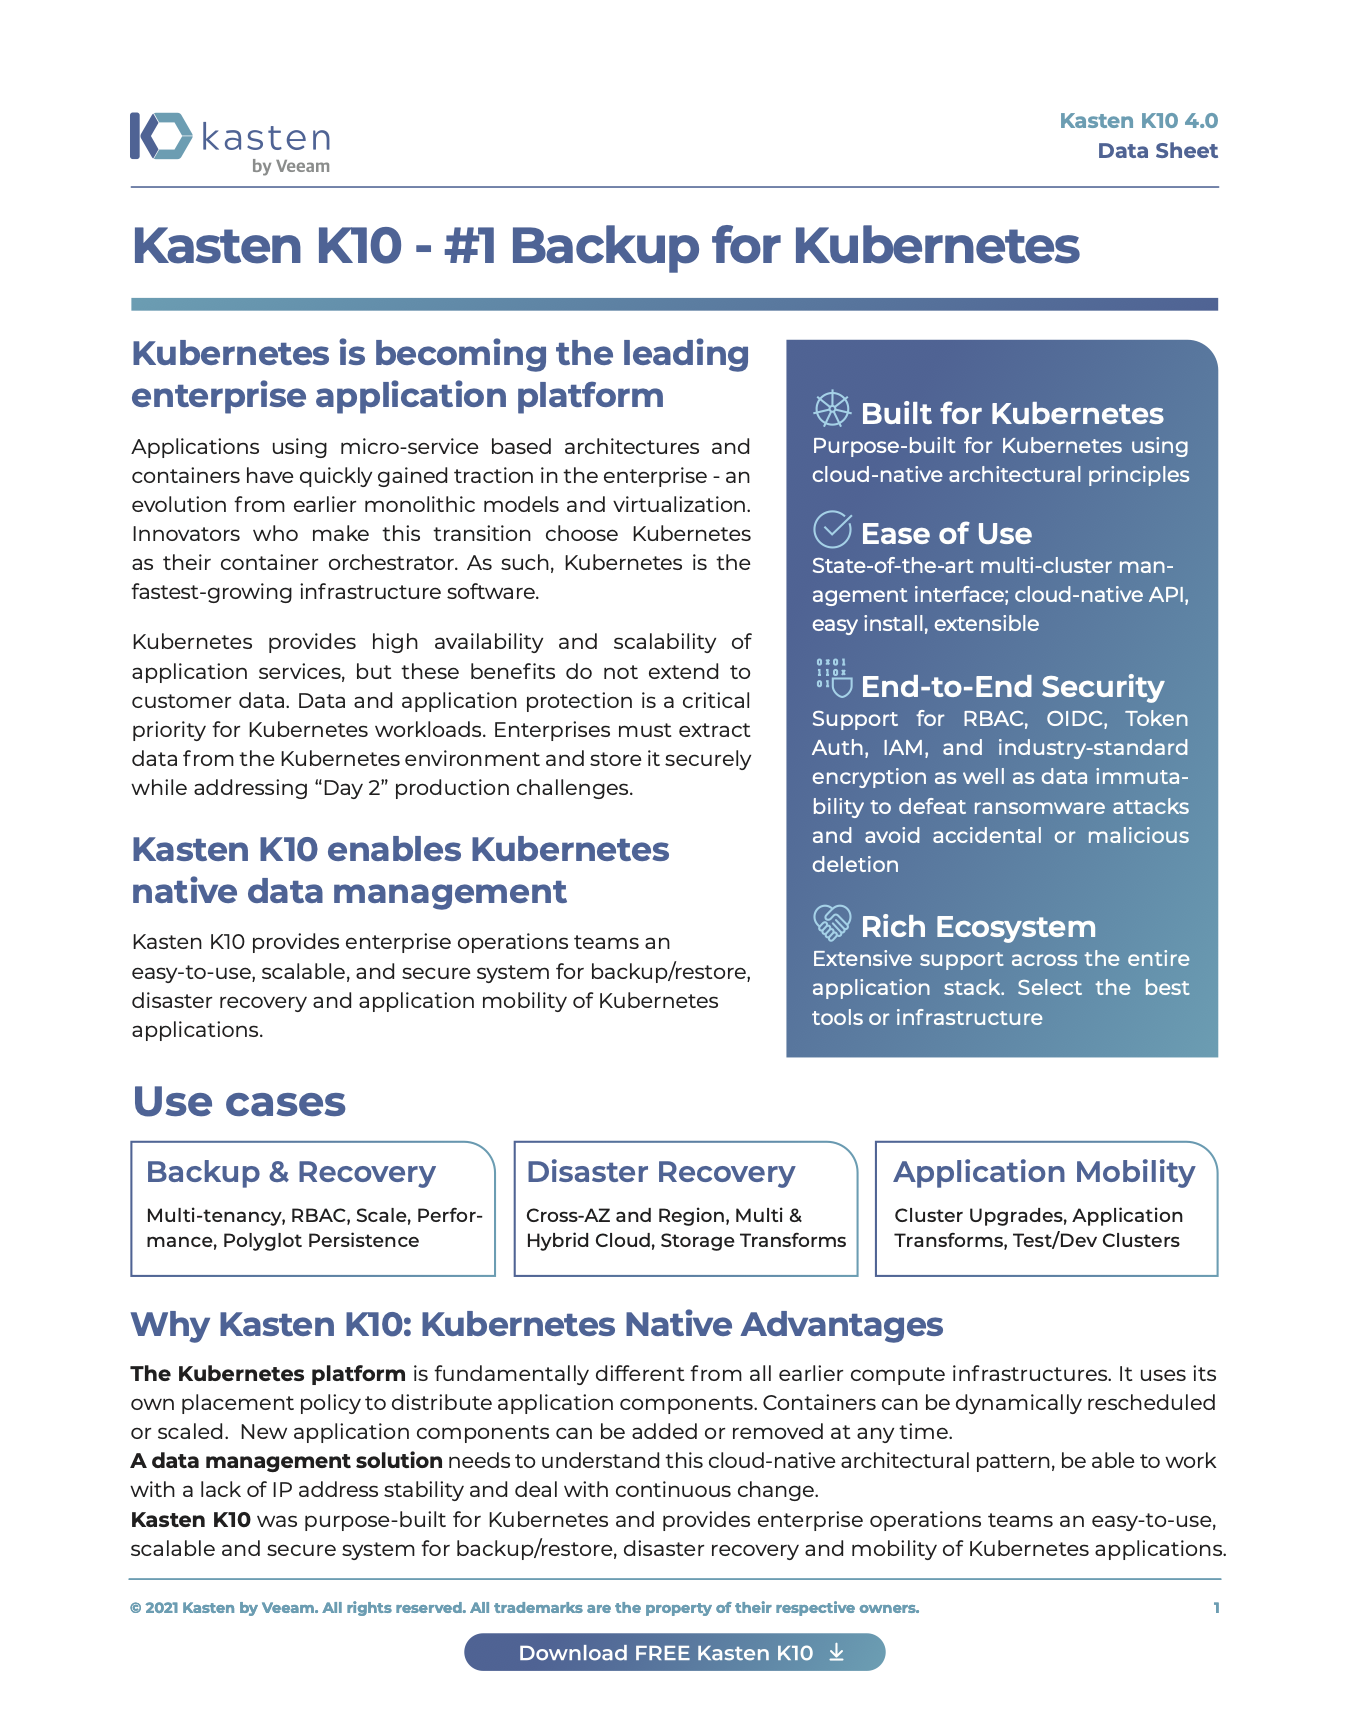 release 4.0 data sheet-thumbnail-resounrces-1